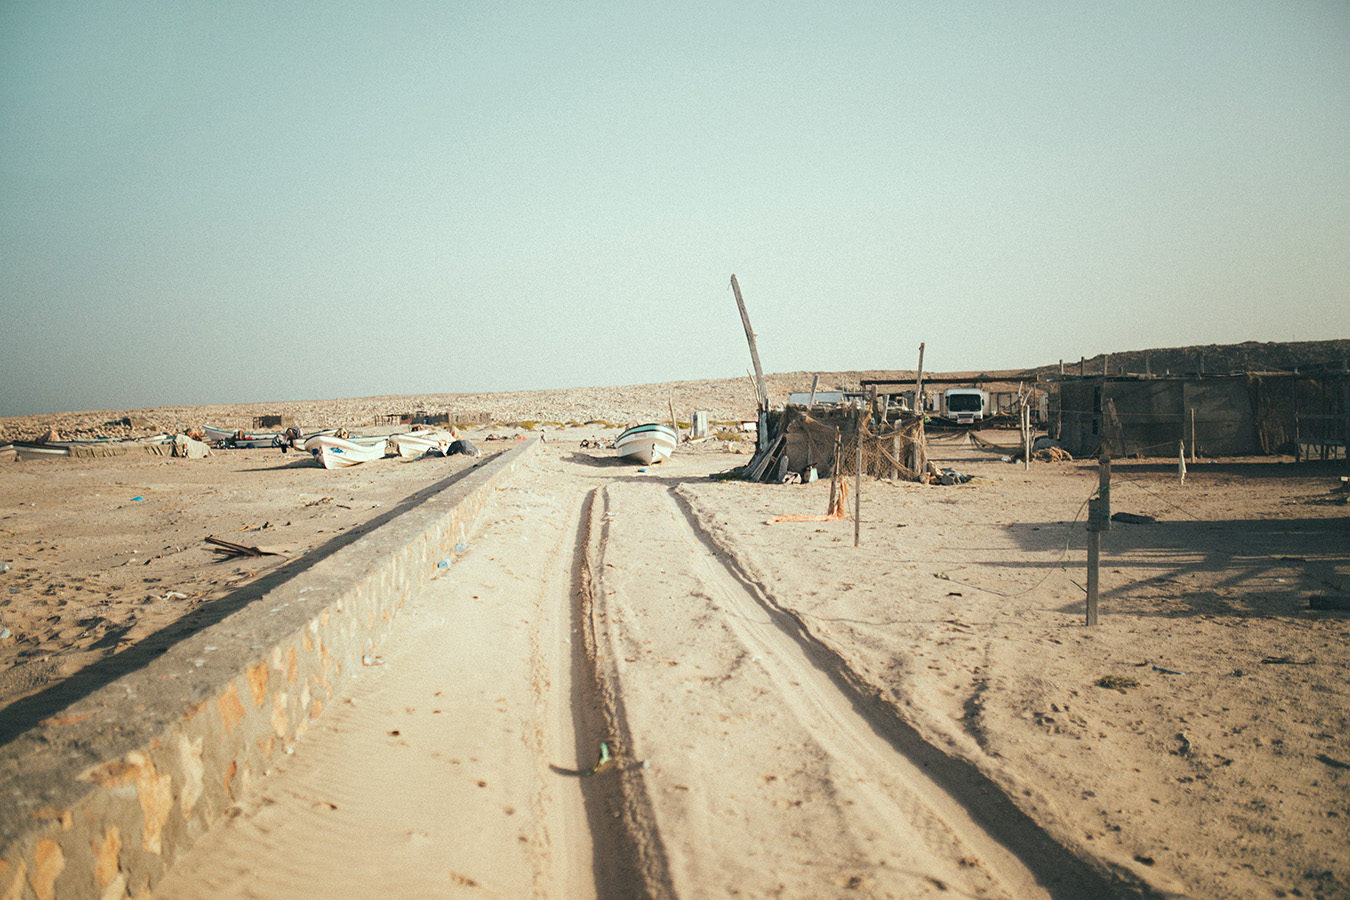 Ras Al Hadd, Oman